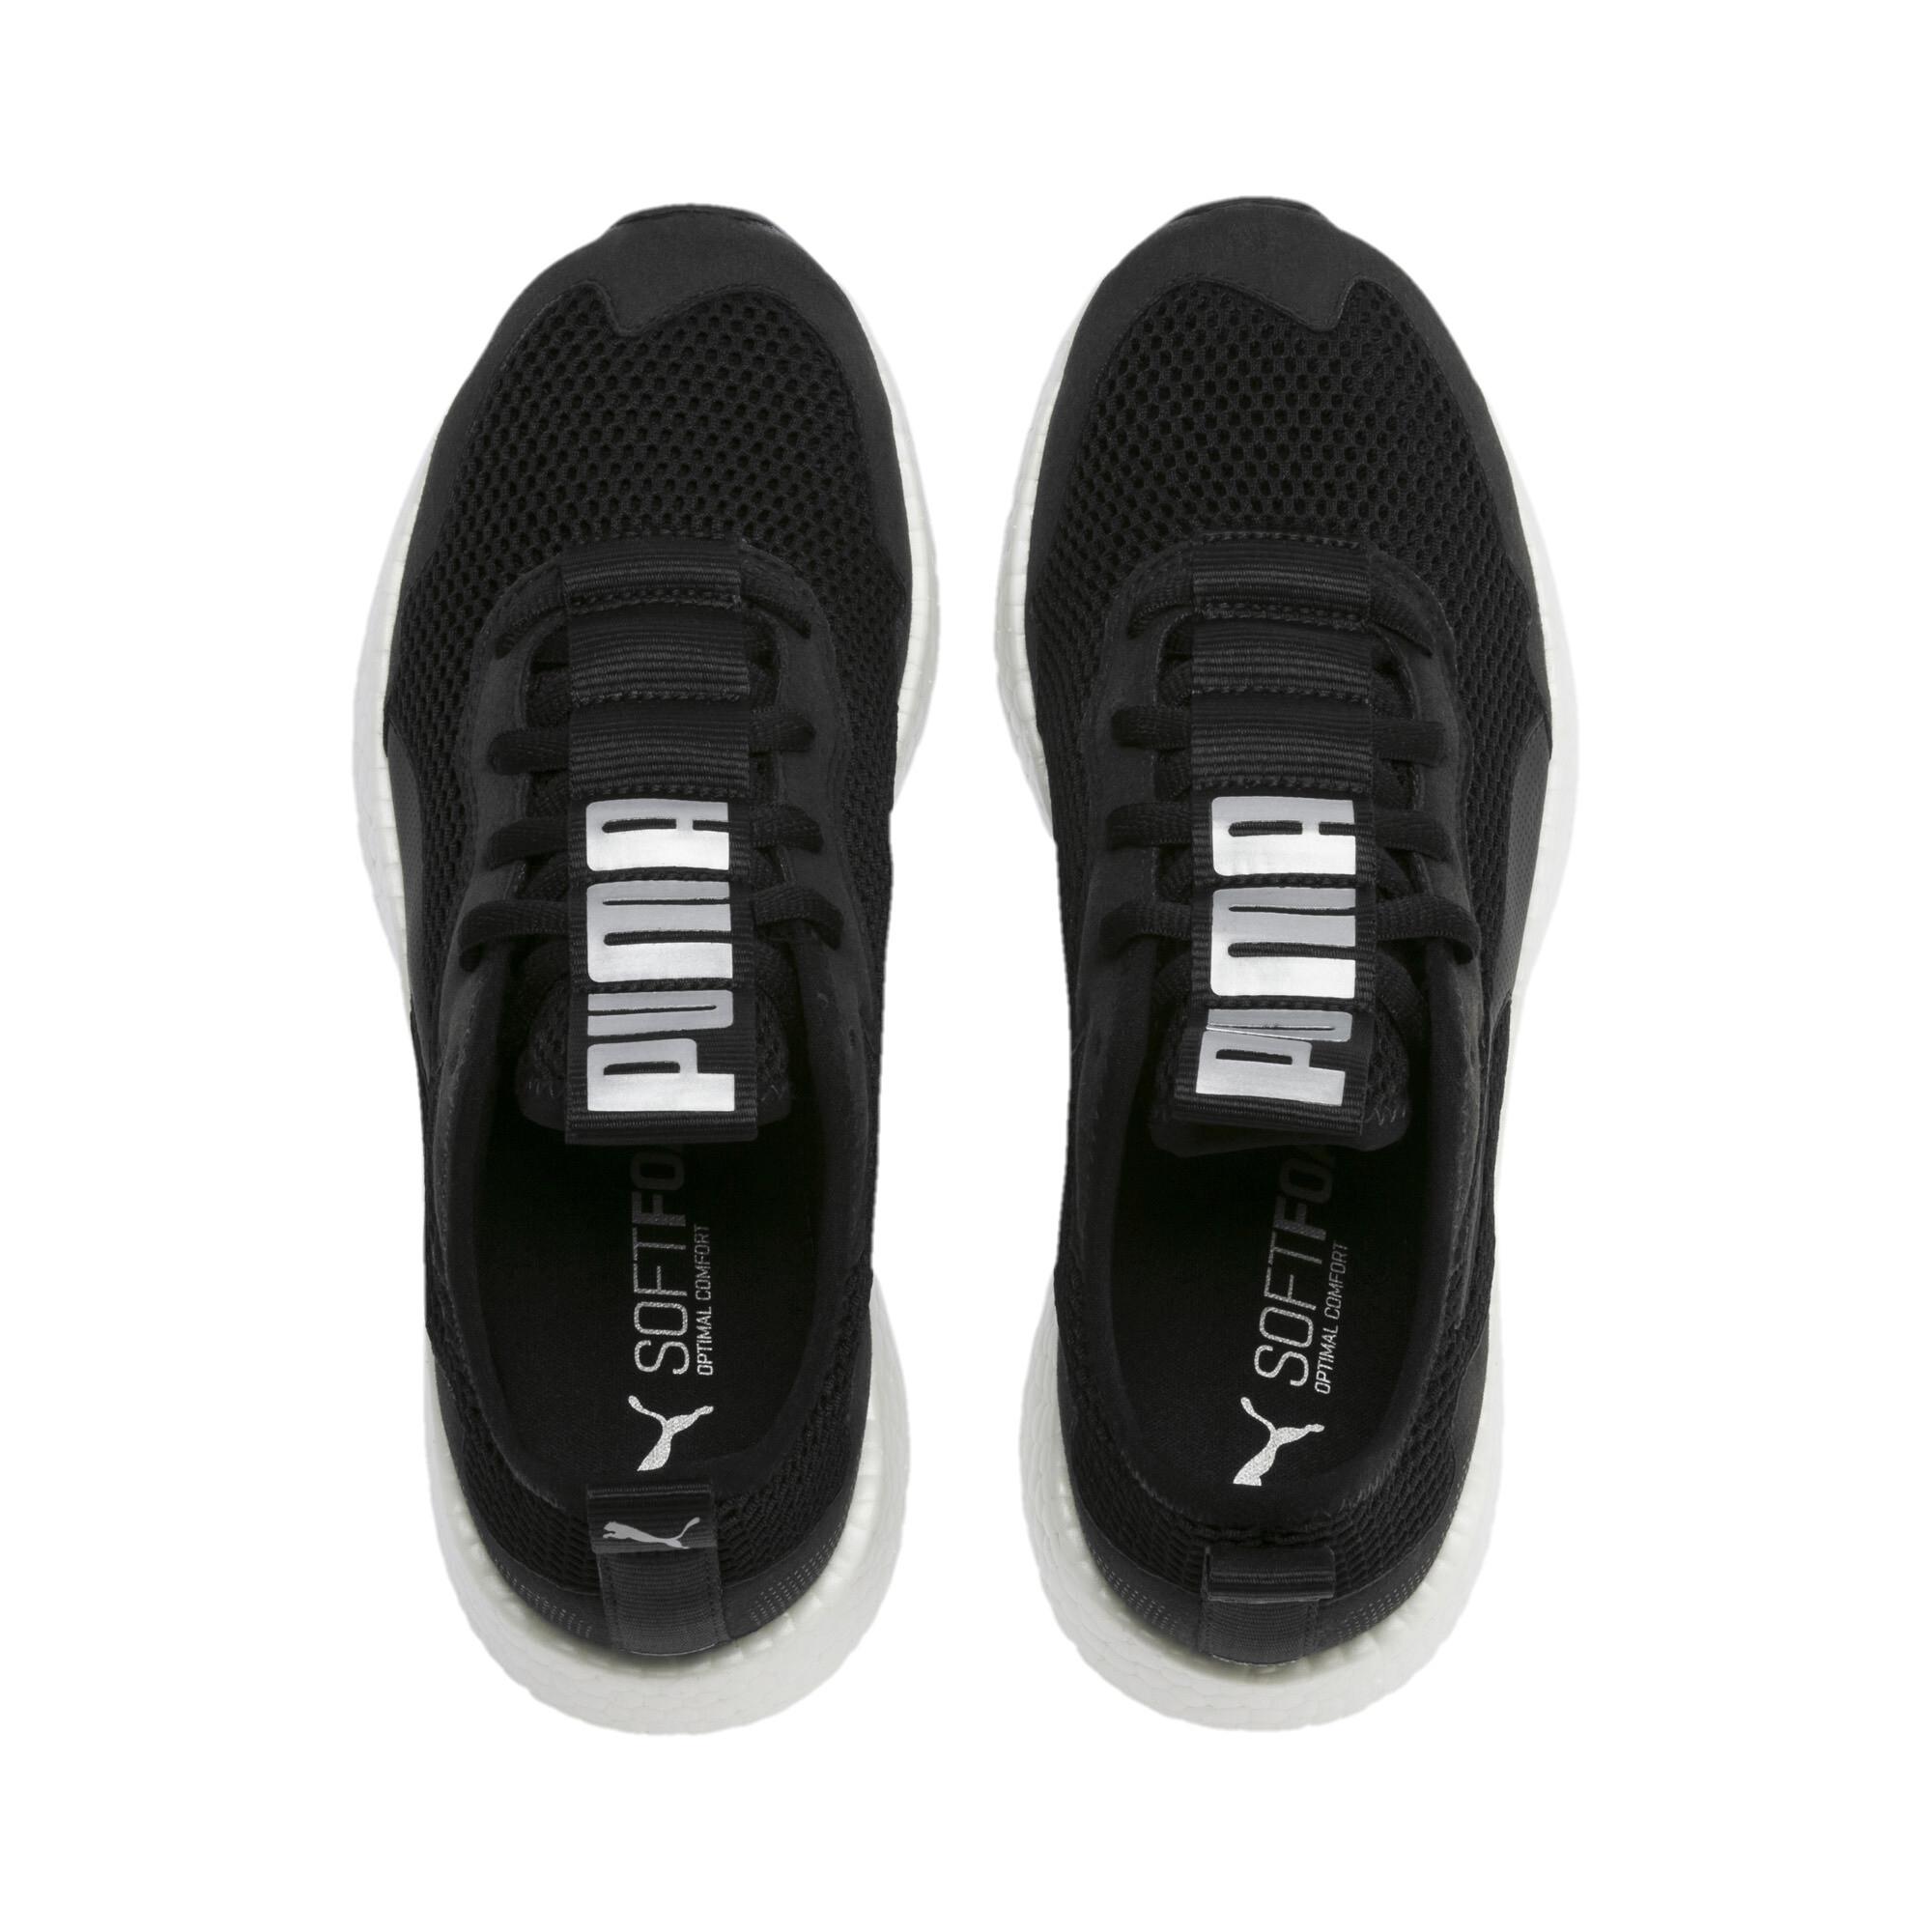 PUMA-Women-039-s-NRGY-Neko-Skim-Running-Shoes thumbnail 15